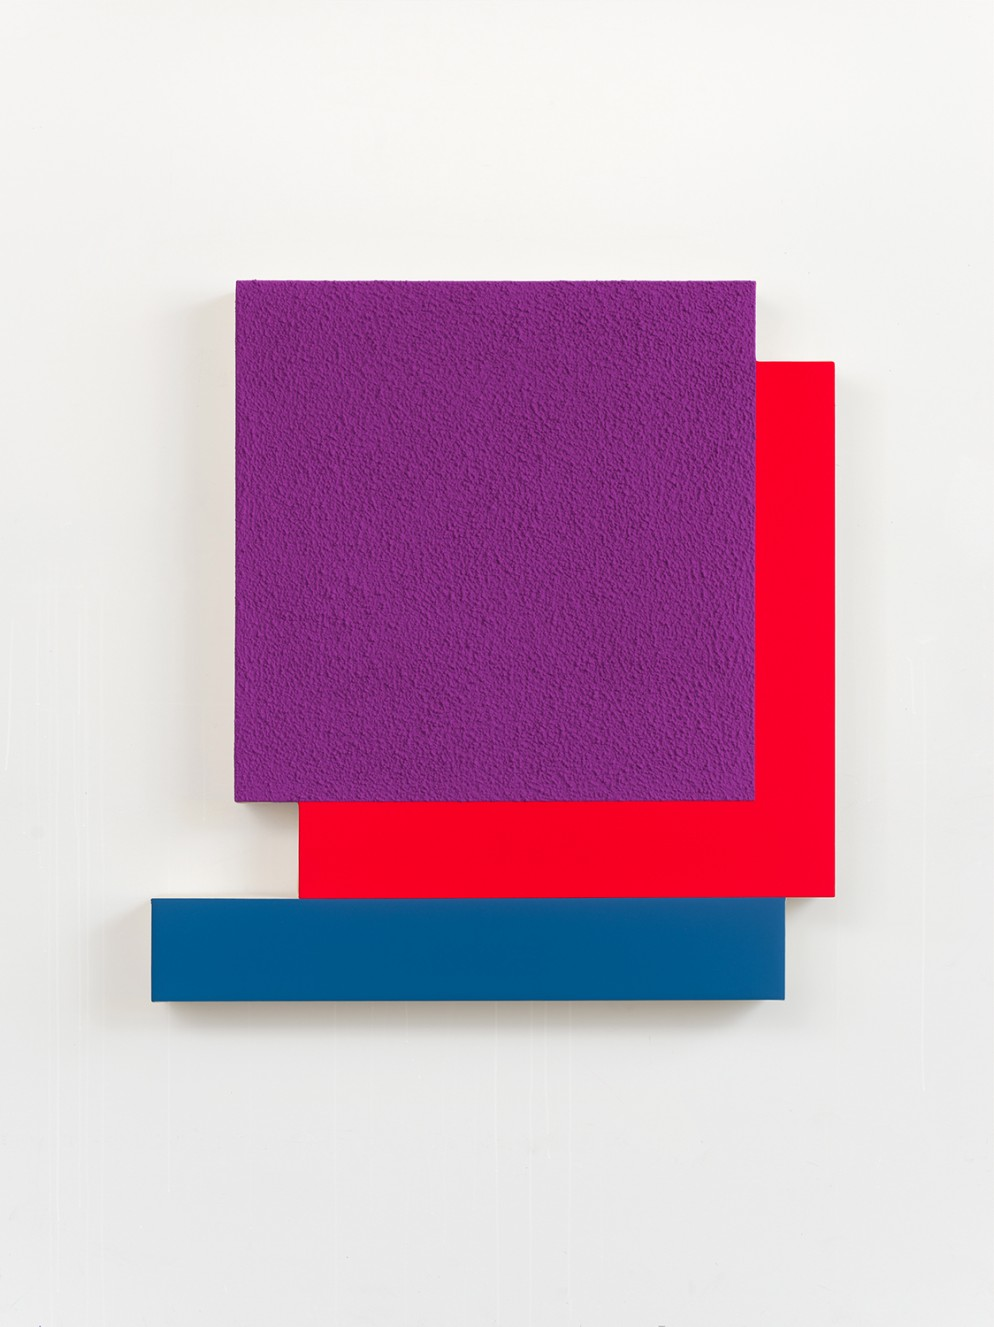 01_Established-Contemporary_Massimo-Minini_Halley